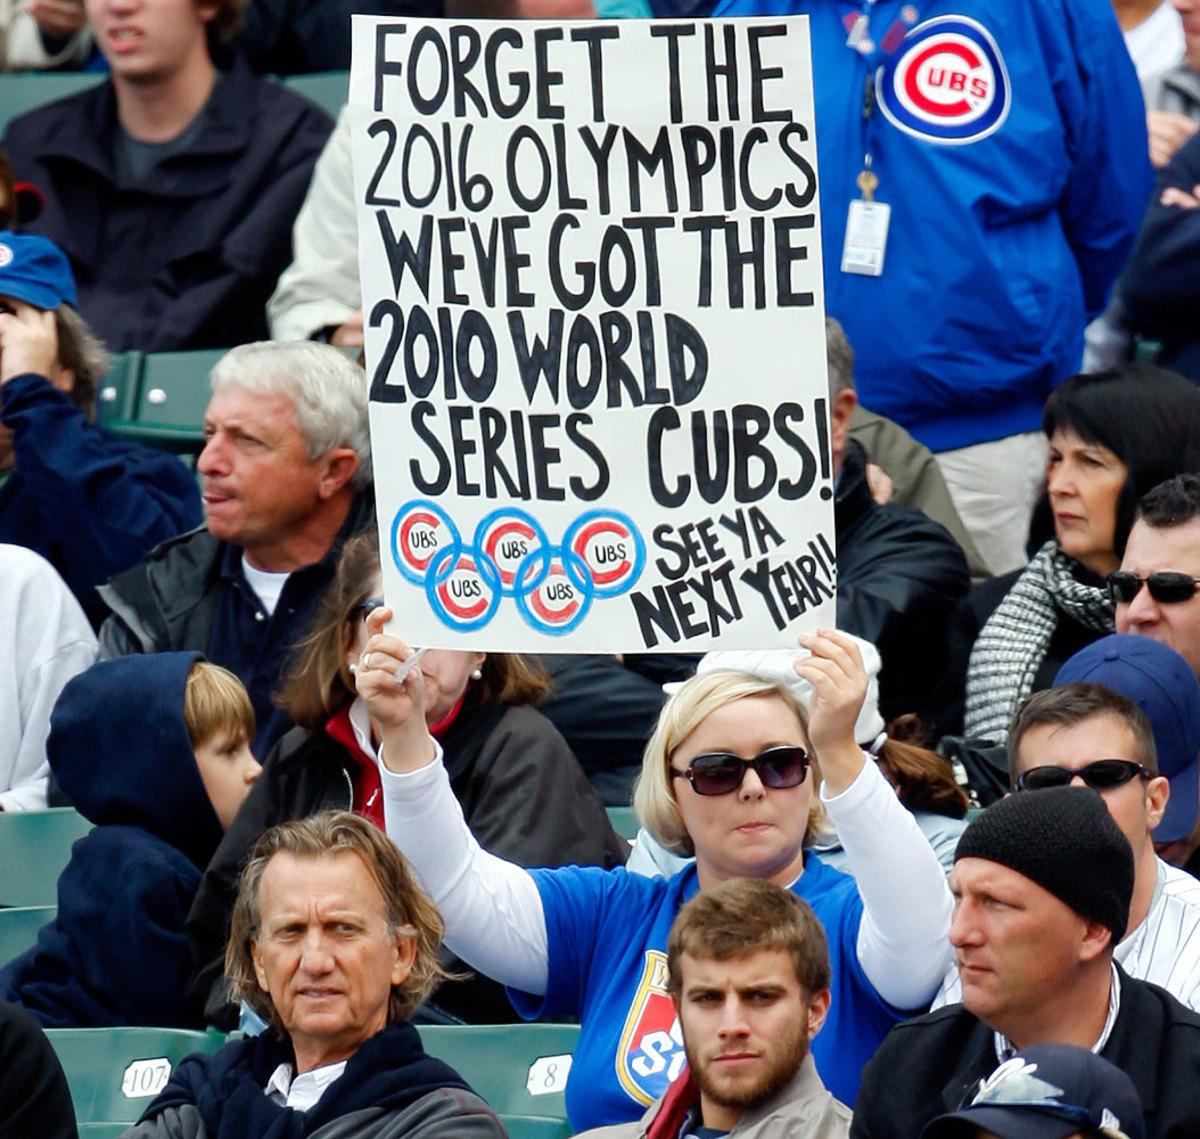 2009-Chicago-Cubs-fan-sign-AP_091003021978.jpg